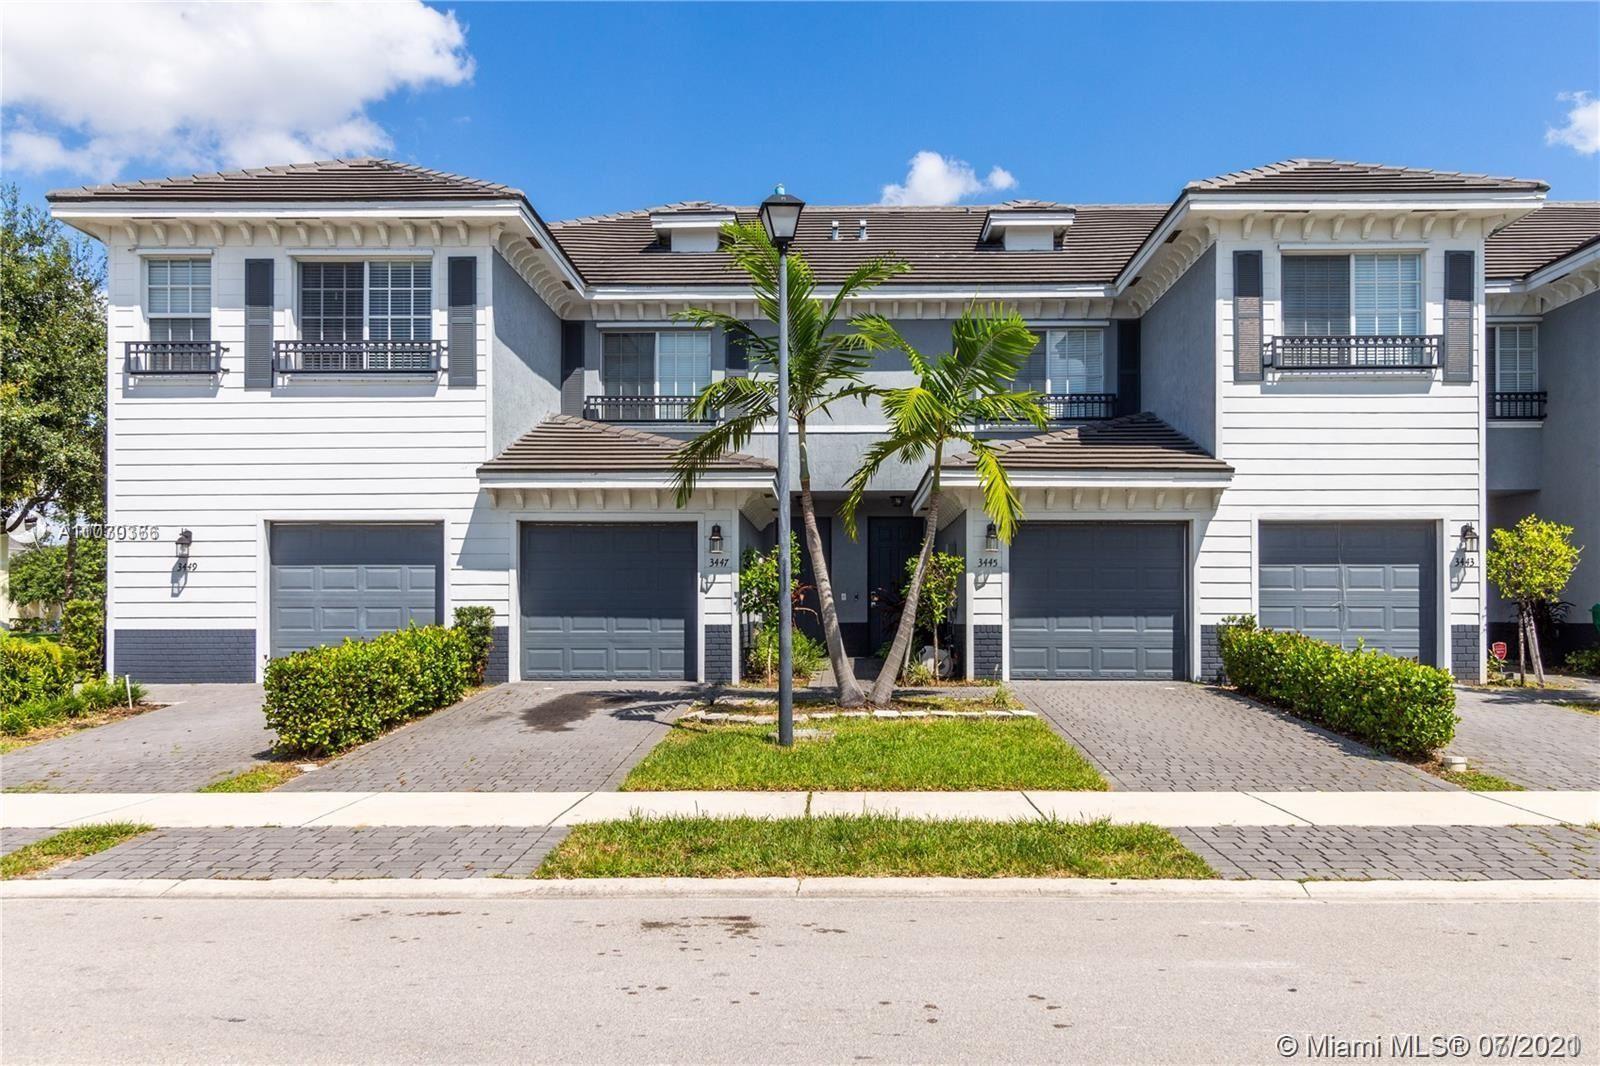 Photo of 3491 NW 13th St, Lauderhill, FL 33311 (MLS # A11070366)